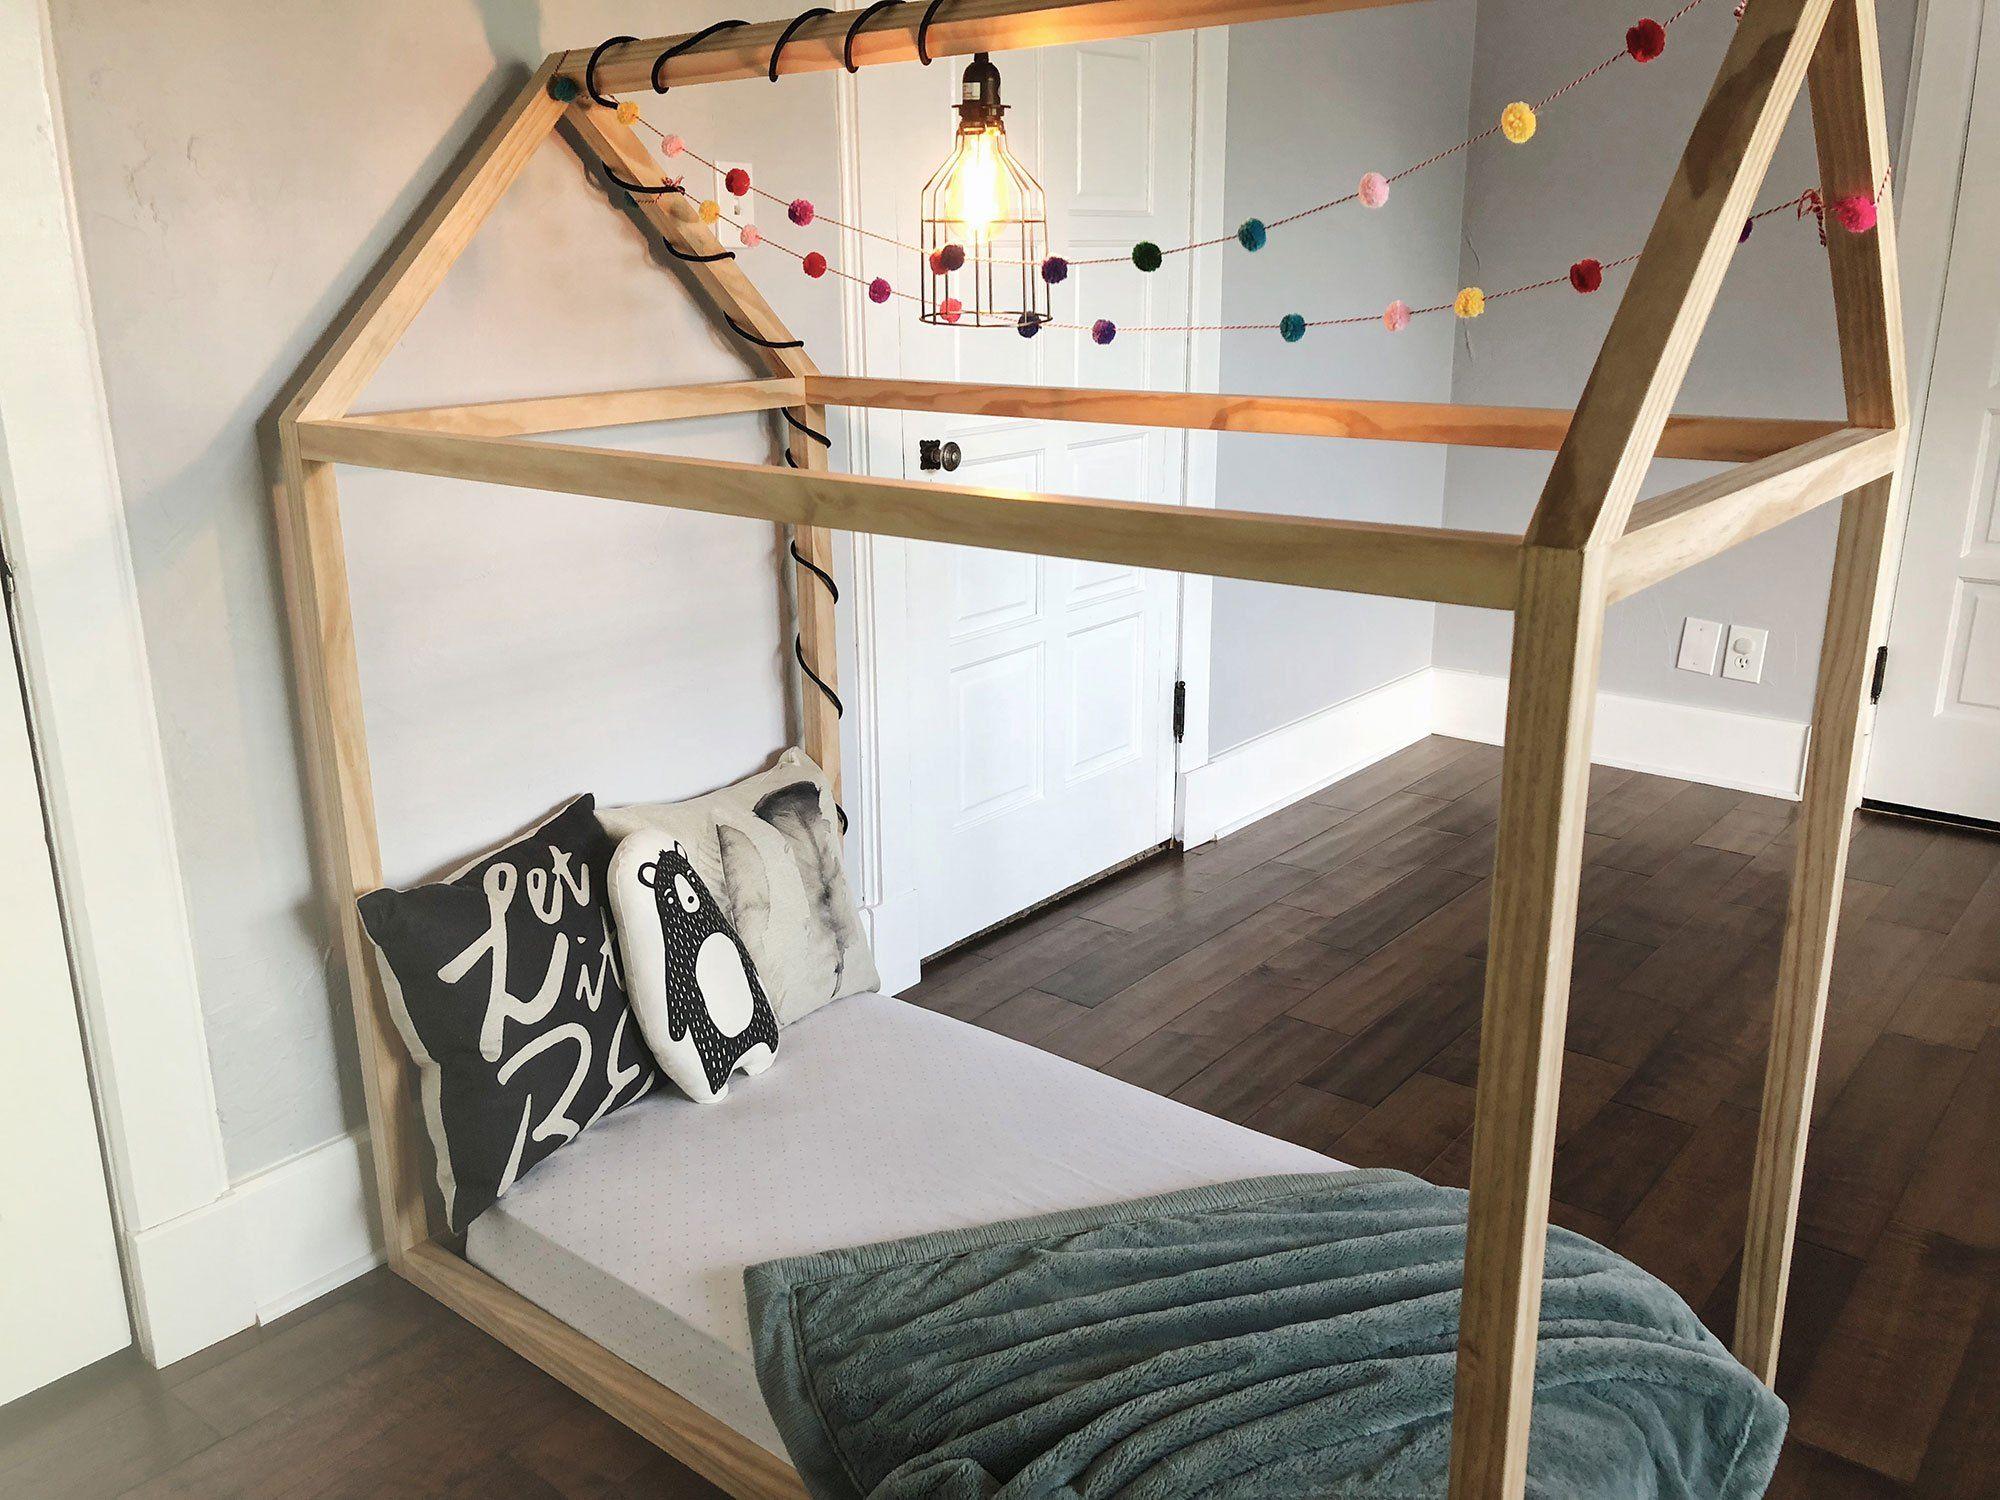 Diy Toddler House Bed The Okie Home Pinterest Diy Toddler Bed